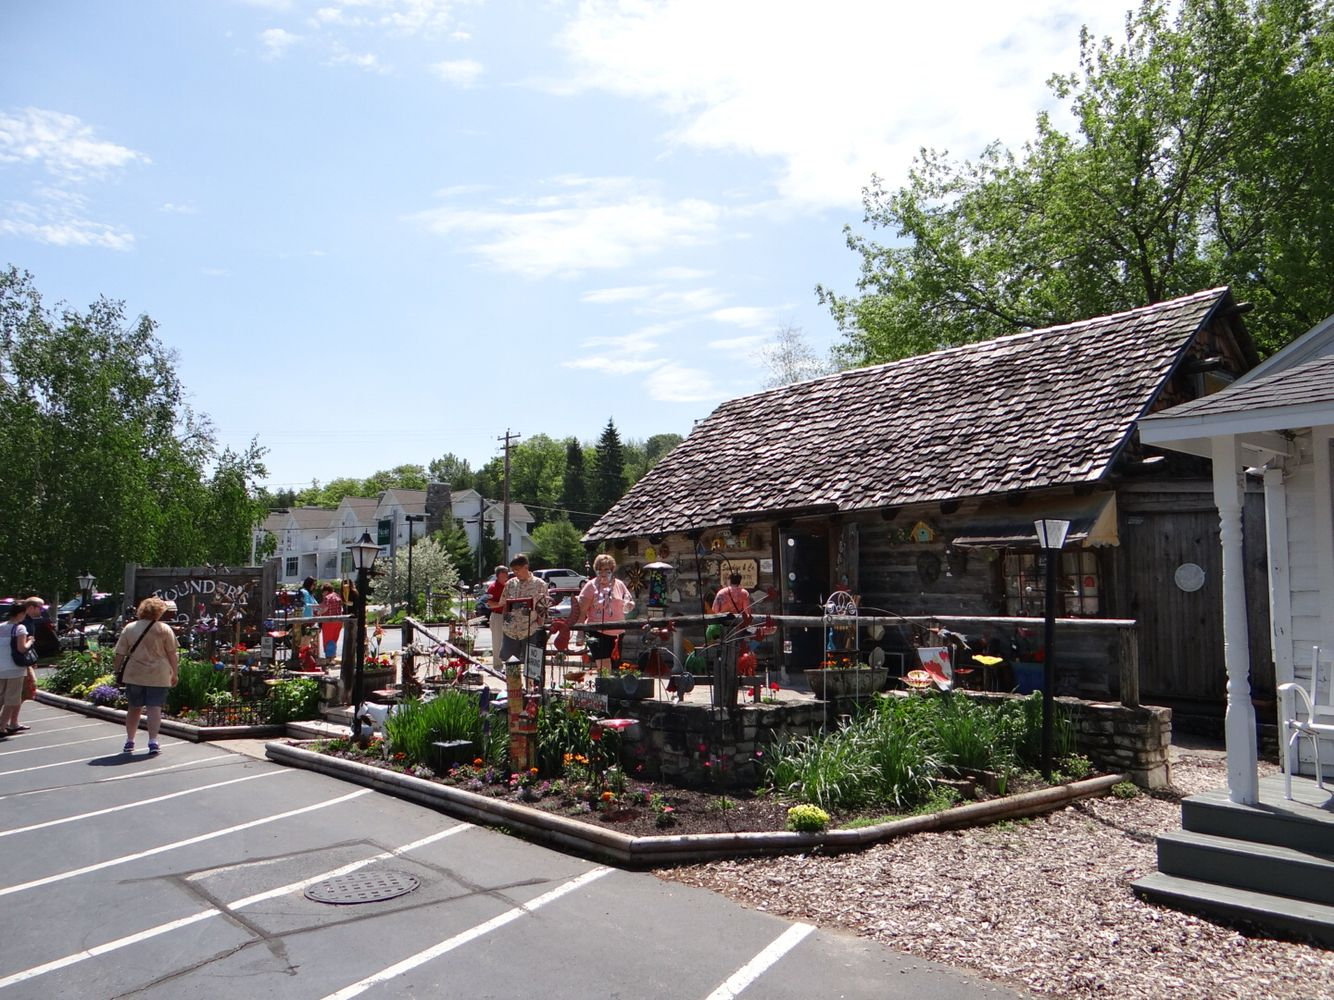 Sun Garden Gartenmobel ~ Combinations in bloom my cms yard yards and gardens